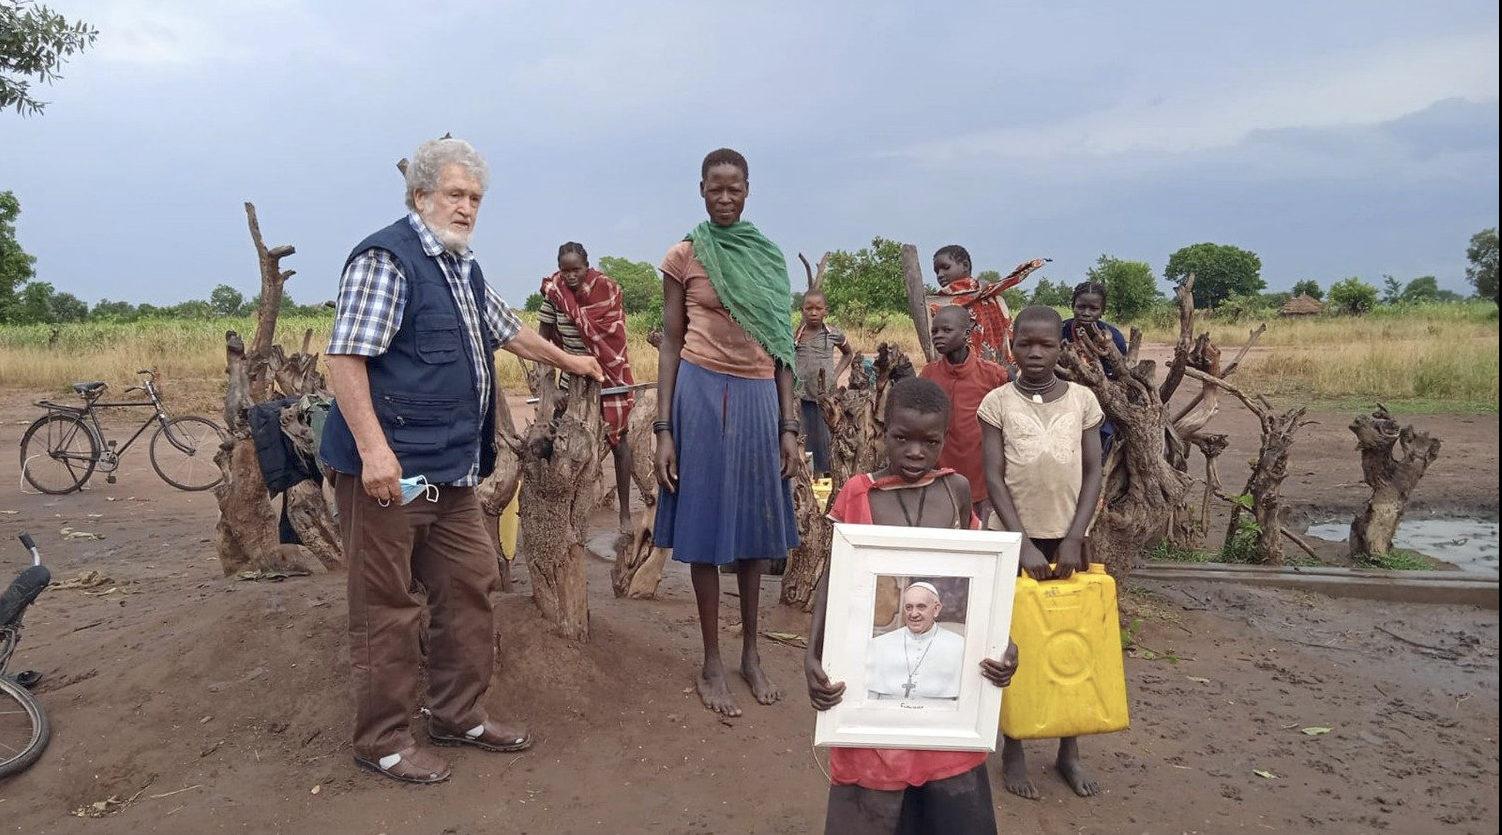 La communauté d'Apeitolim à Moroto (Ouganda), capture / Vatican News